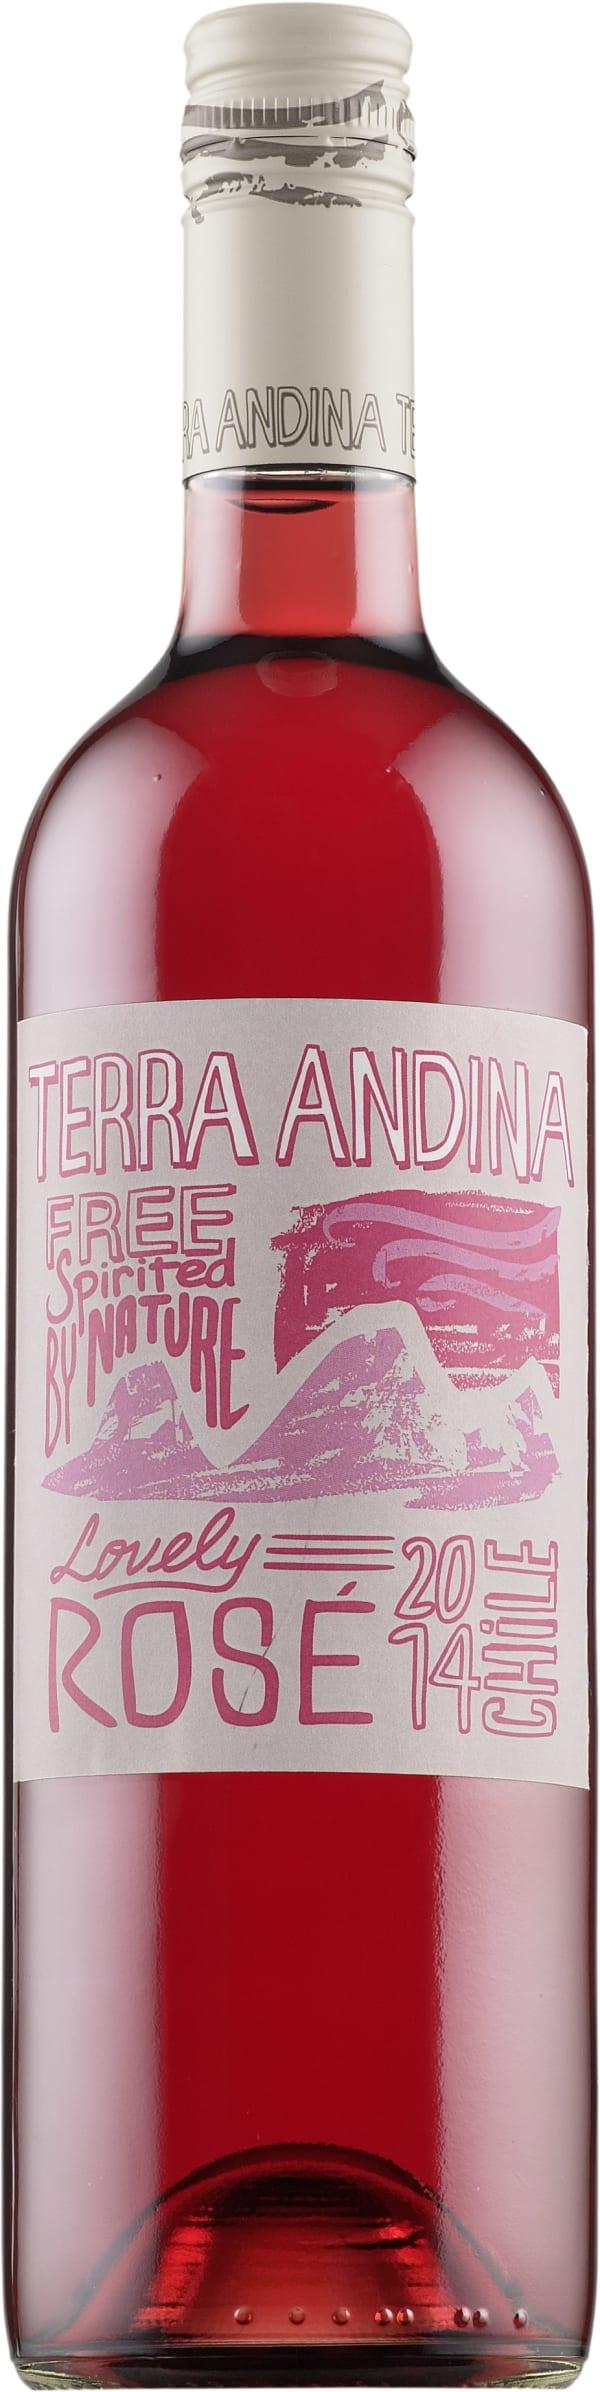 Terra Andina Lovely Rosé 2015